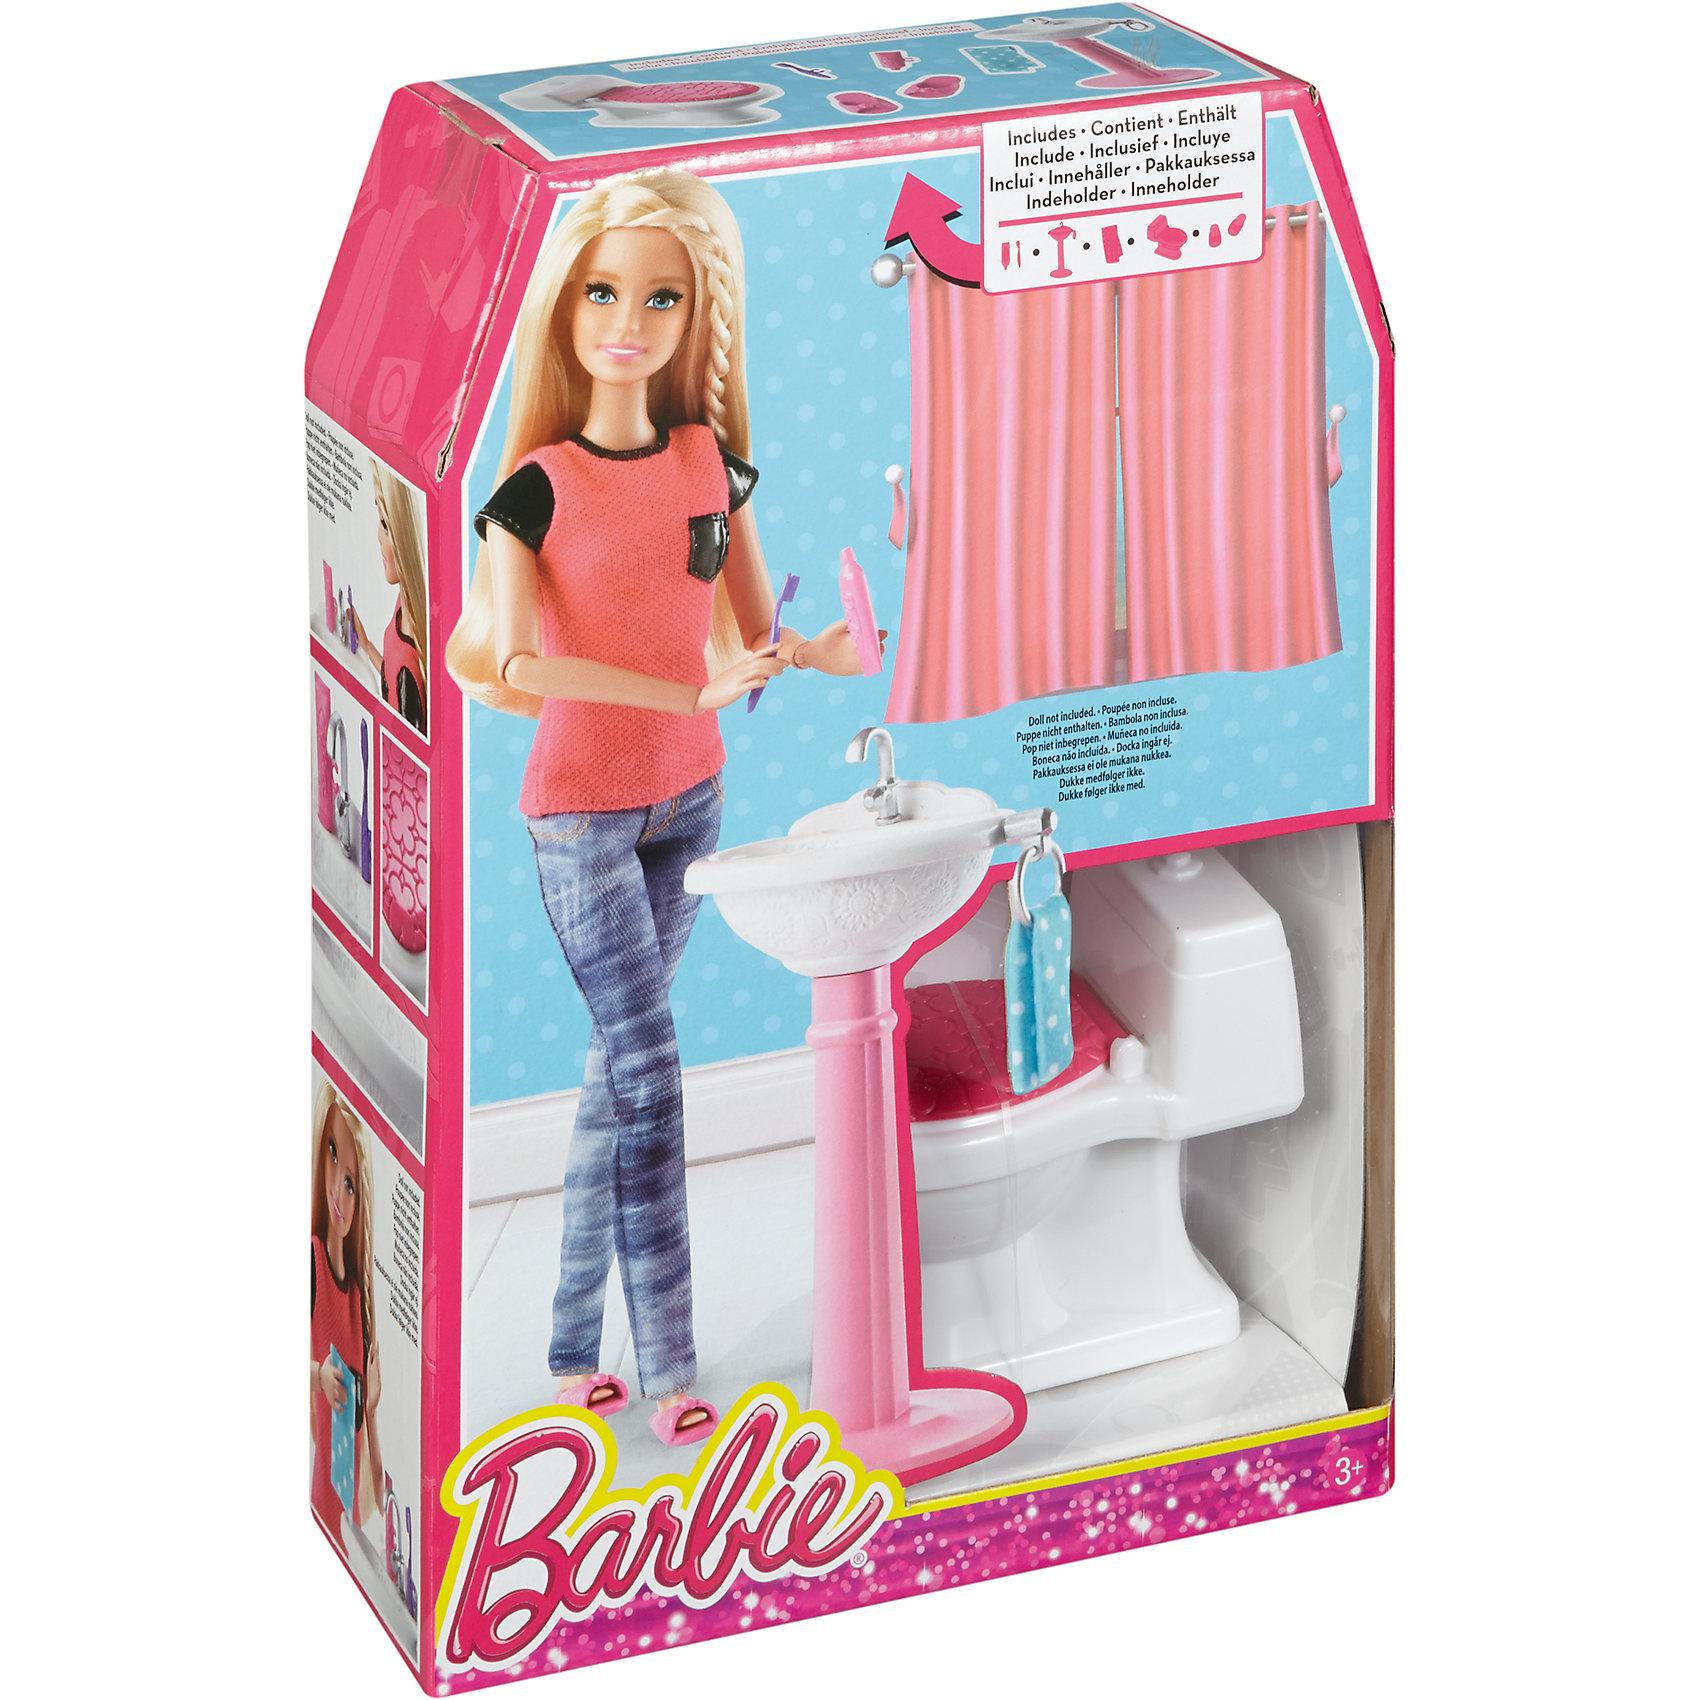 ����� ��� ������ ����, Barbie (Mattel)